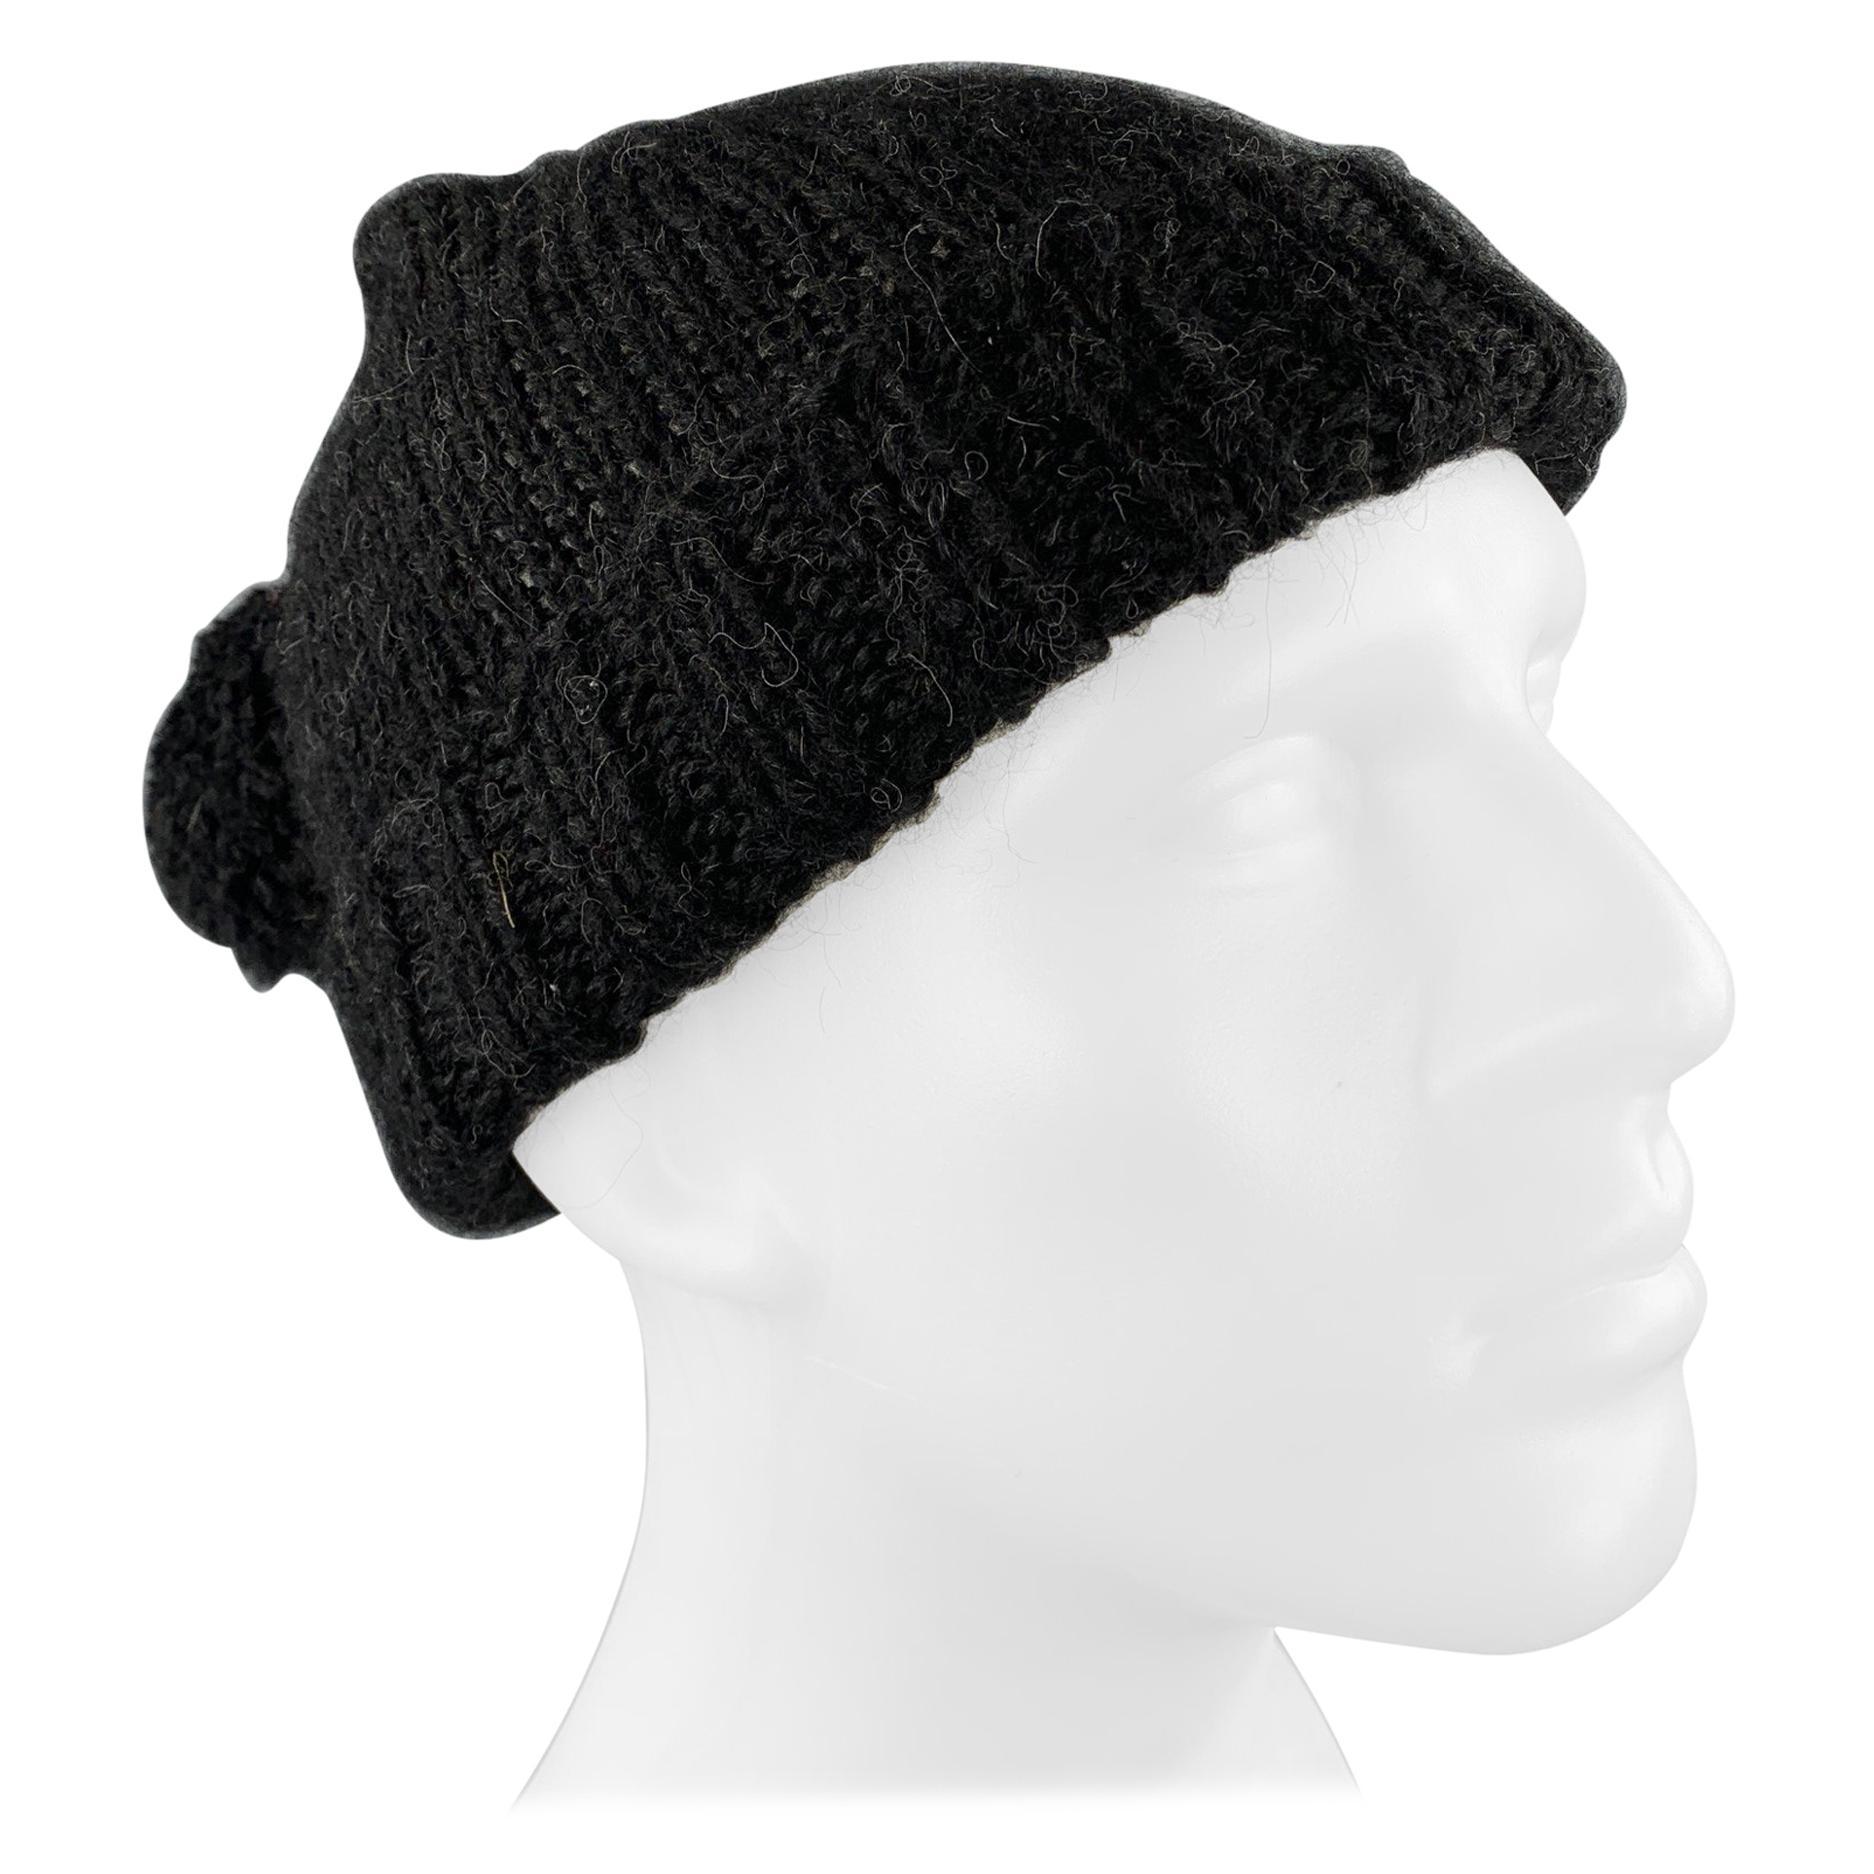 NICOLE FARHI Black Knitted Alpaca Beanie